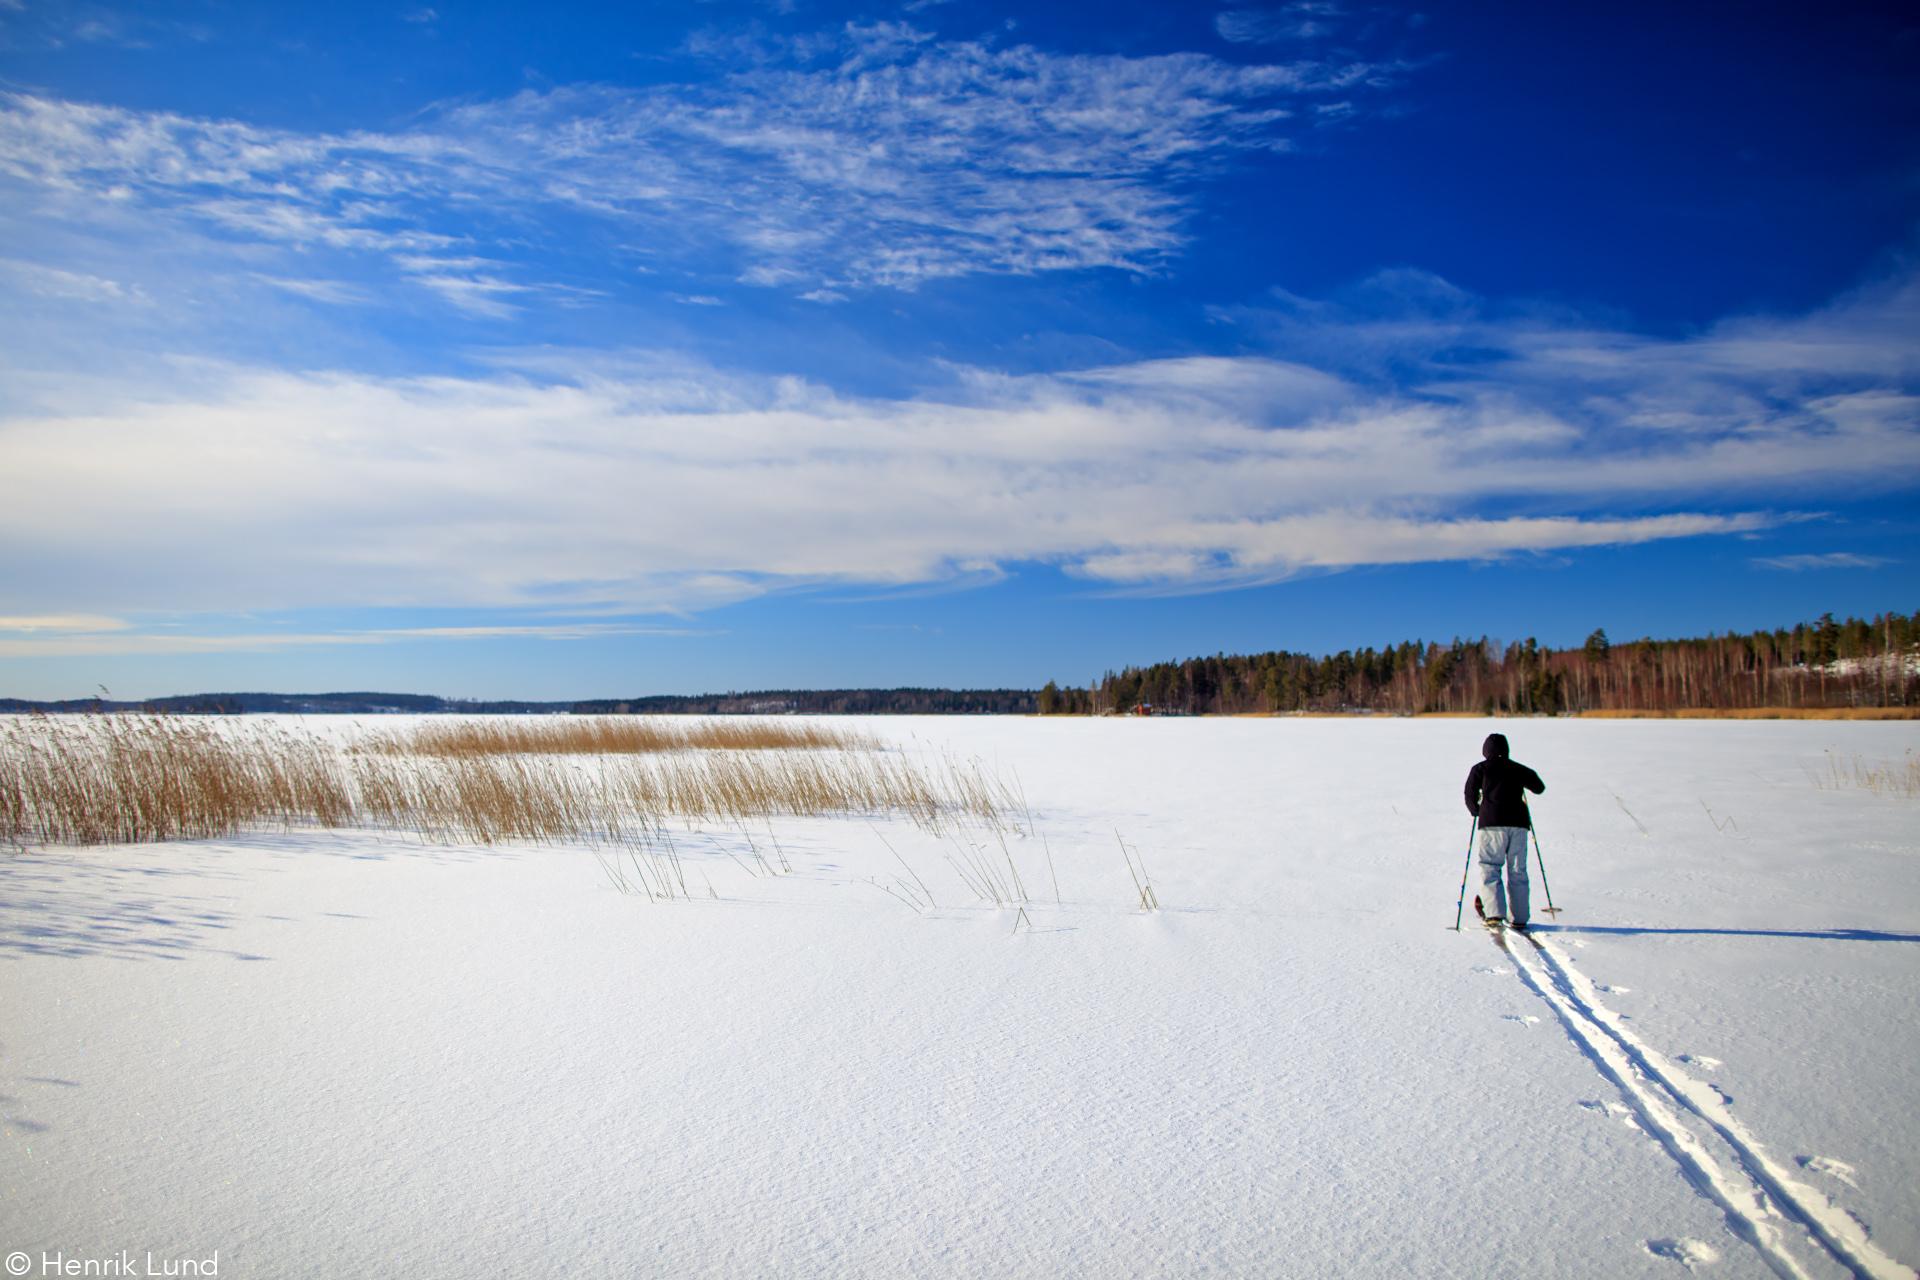 Skier crossing the lake on trekking-skis. Lappträsk, Finand. February 2017.